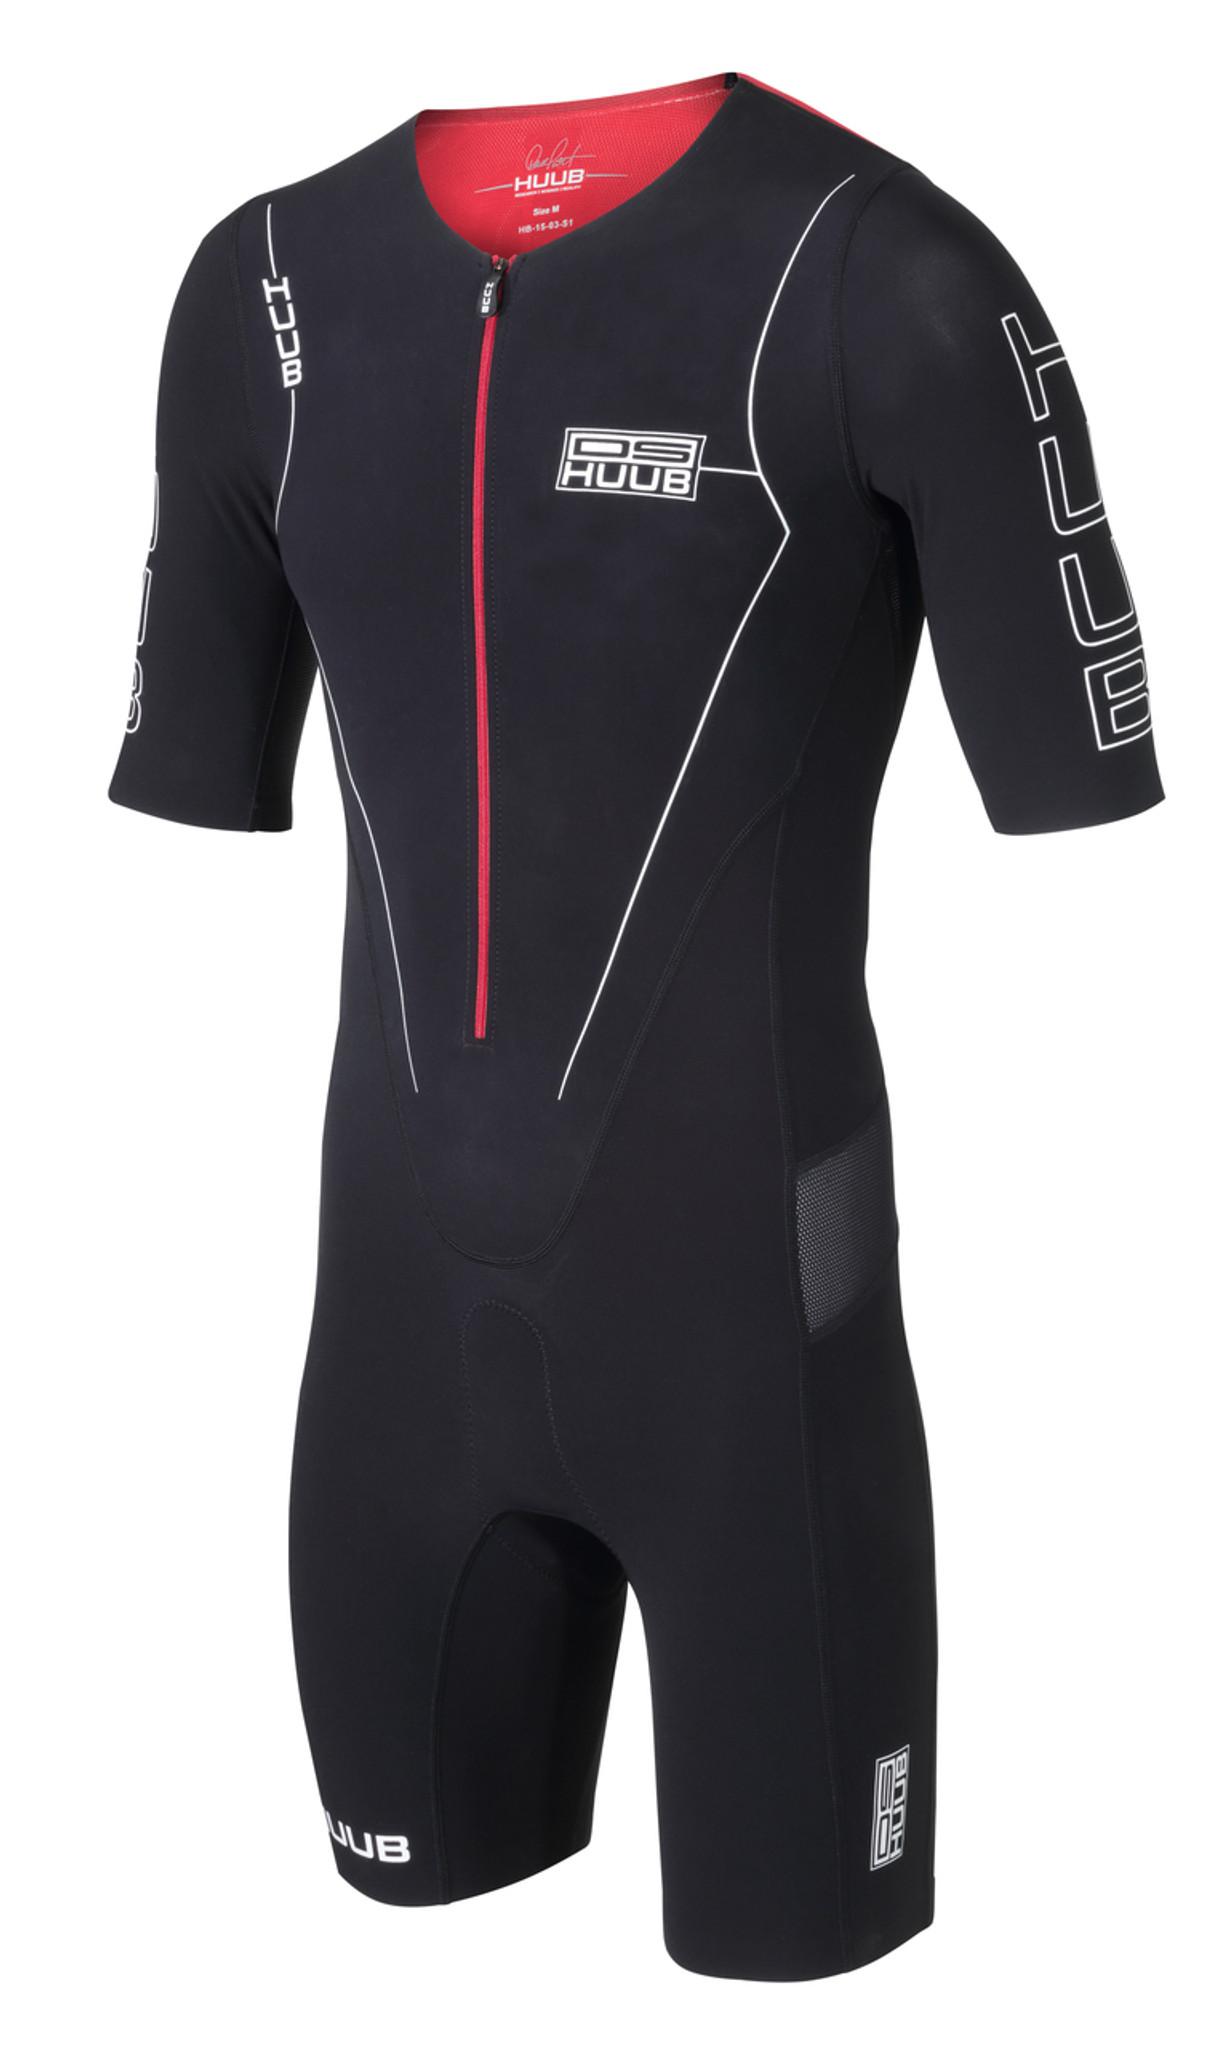 8394f6635 HUUB - Dave Scott Long Course Triathlon Suit - Black